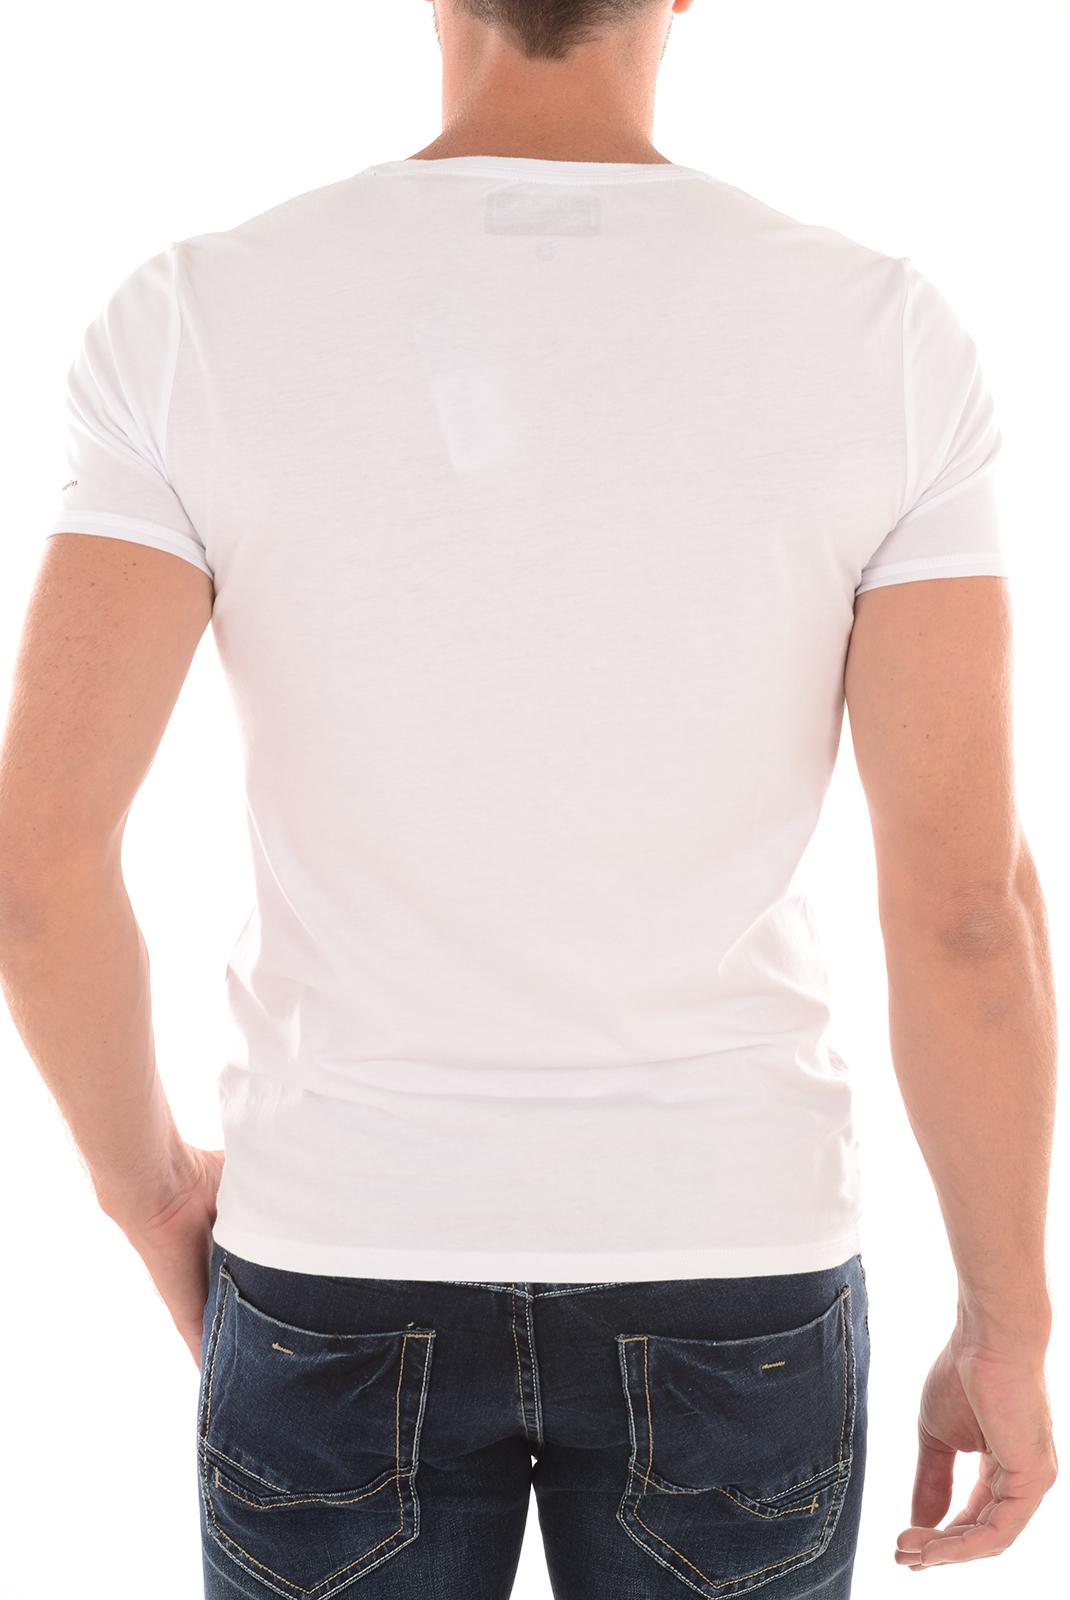 Tee-shirts  Guess jeans M63I67I3Z00 A009 BLANC